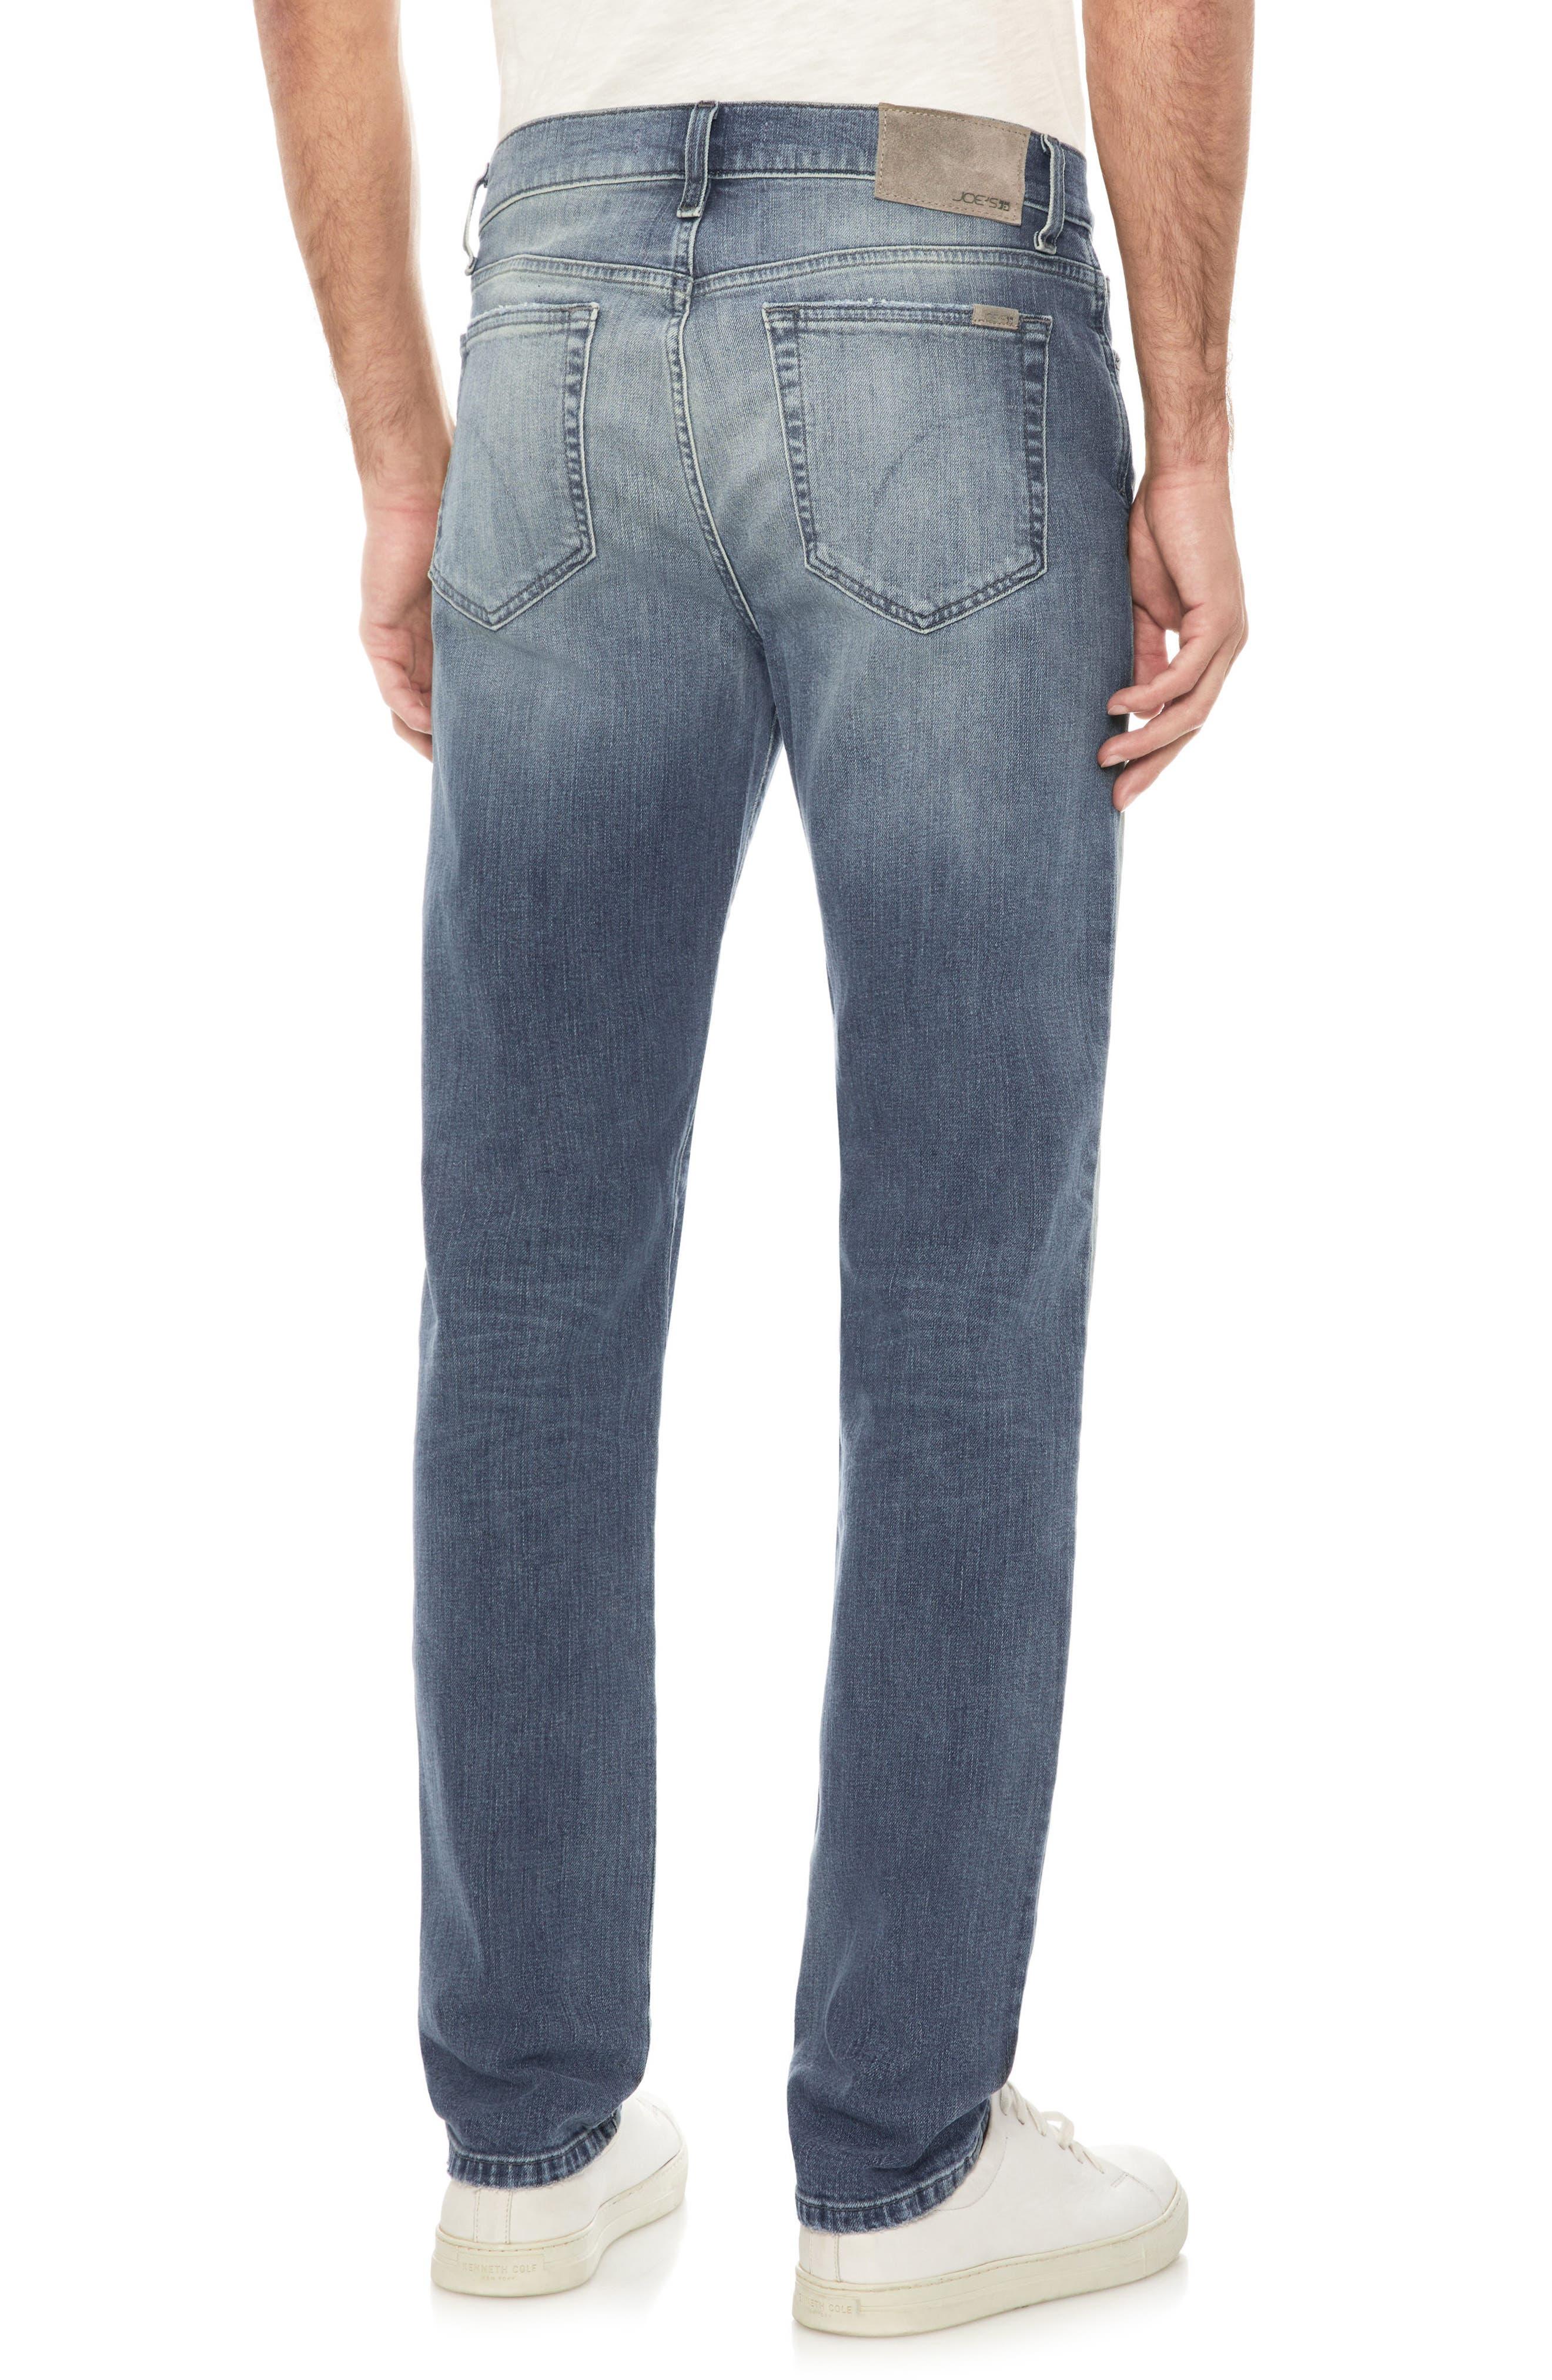 Folsom Slim Fit Jeans,                             Alternate thumbnail 2, color,                             400